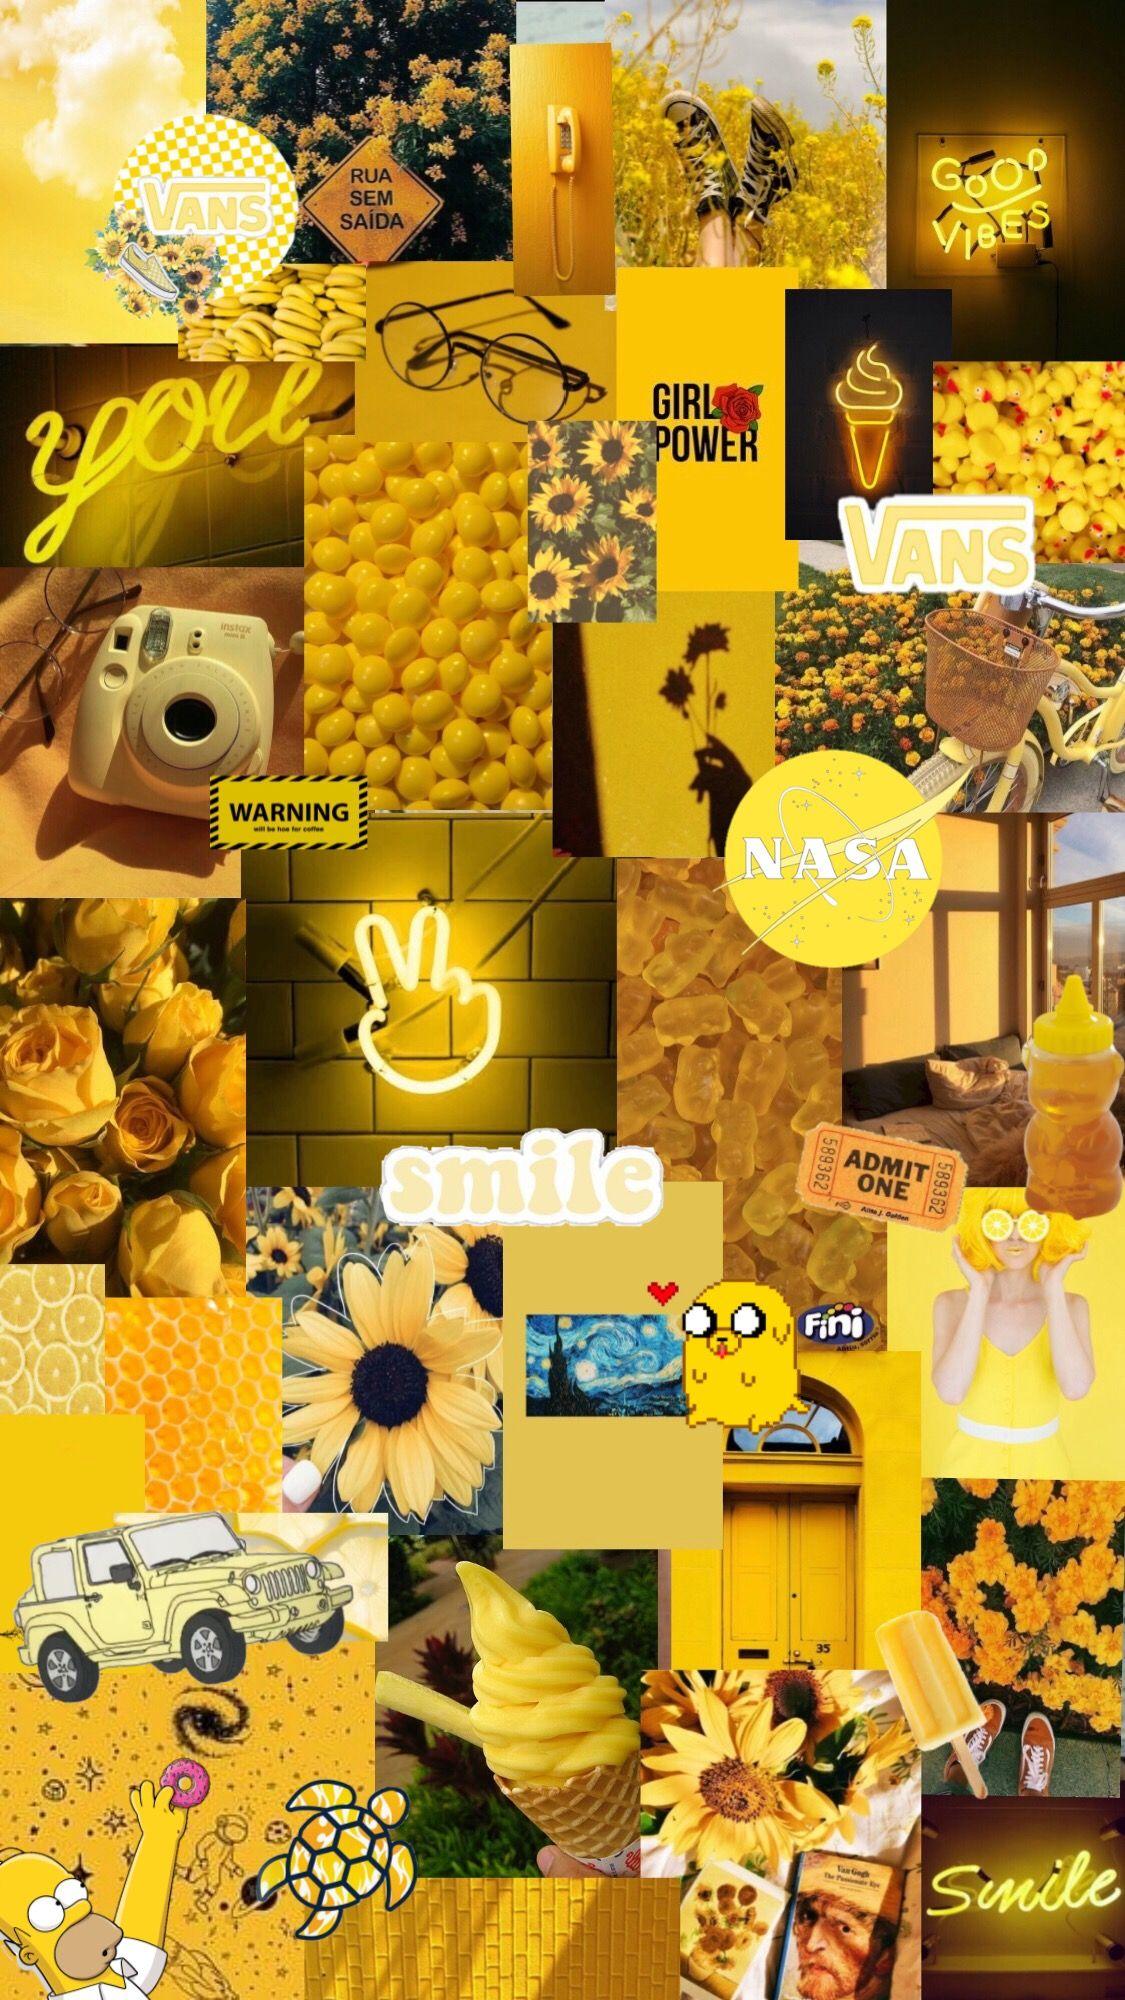 Yellow Wallpaper Aesthetics Yellow Wallpaper Wallpaper Aesthetic Wallpapers